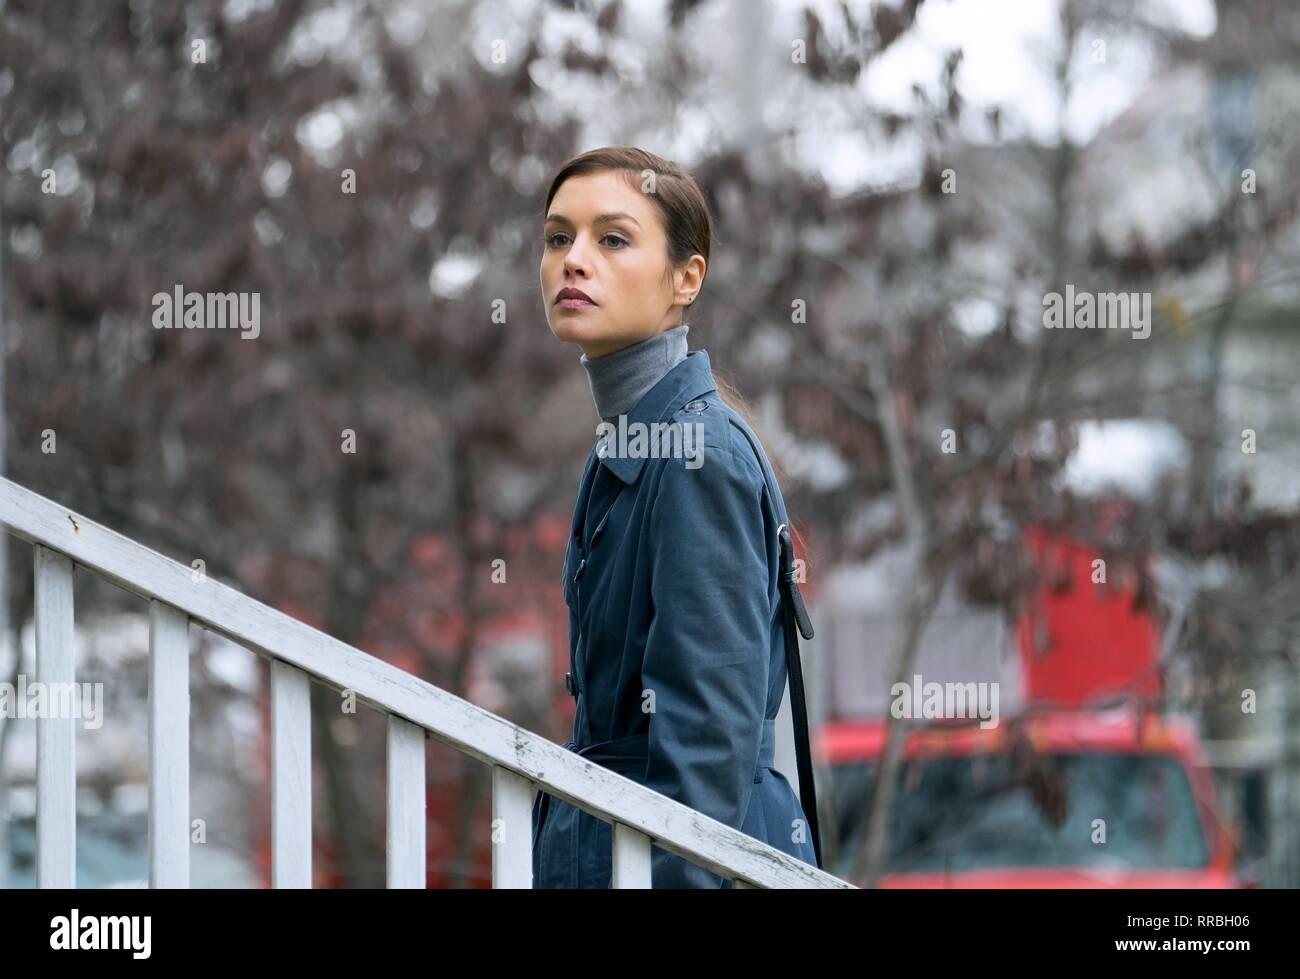 AFTERMATH, HANNAH WARE, 2017 - Stock Image